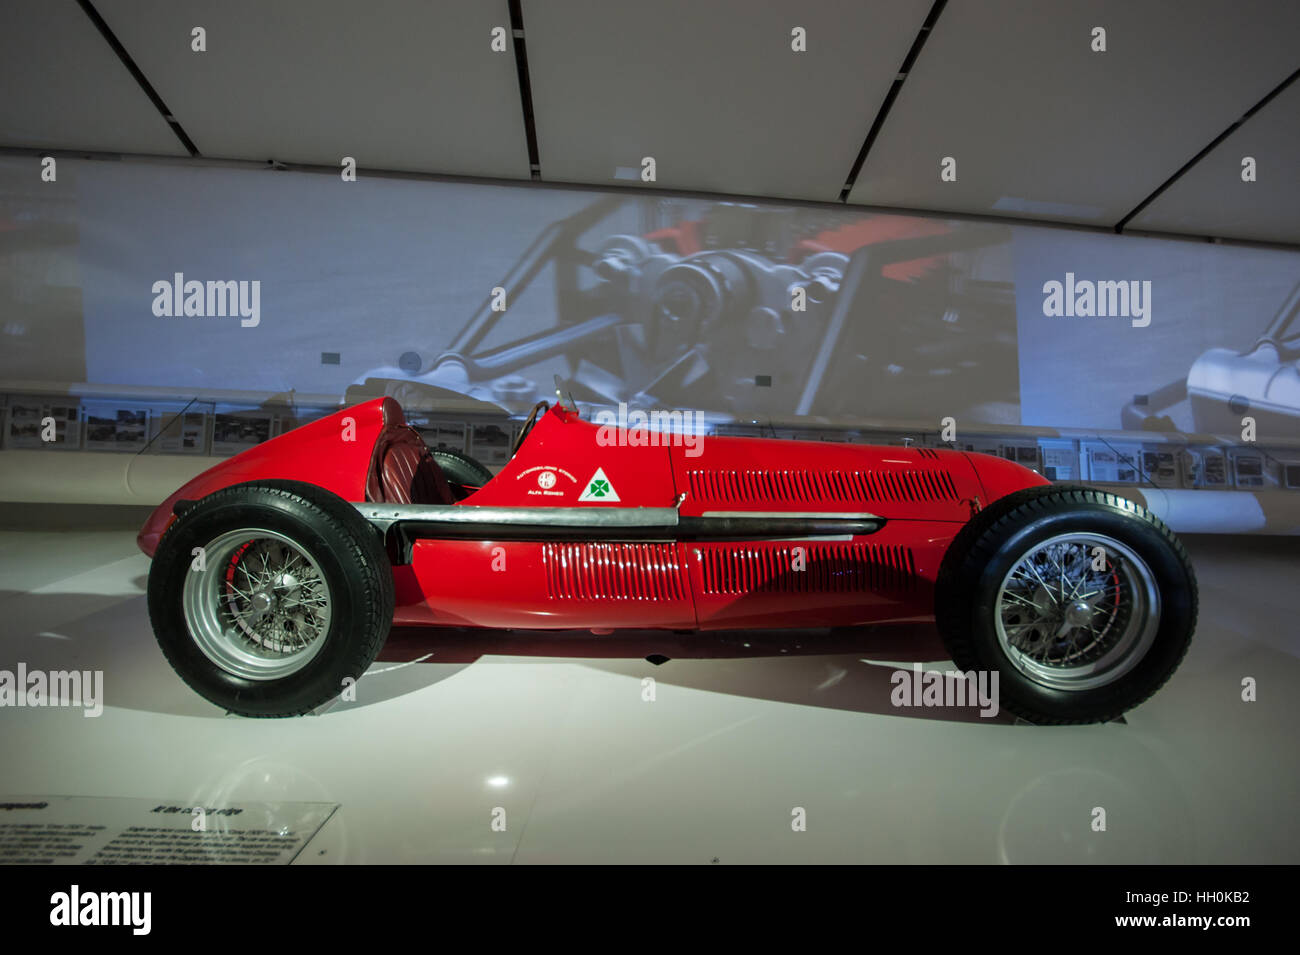 alfa romeo racing car stock photos alfa romeo racing car stock images alamy. Black Bedroom Furniture Sets. Home Design Ideas